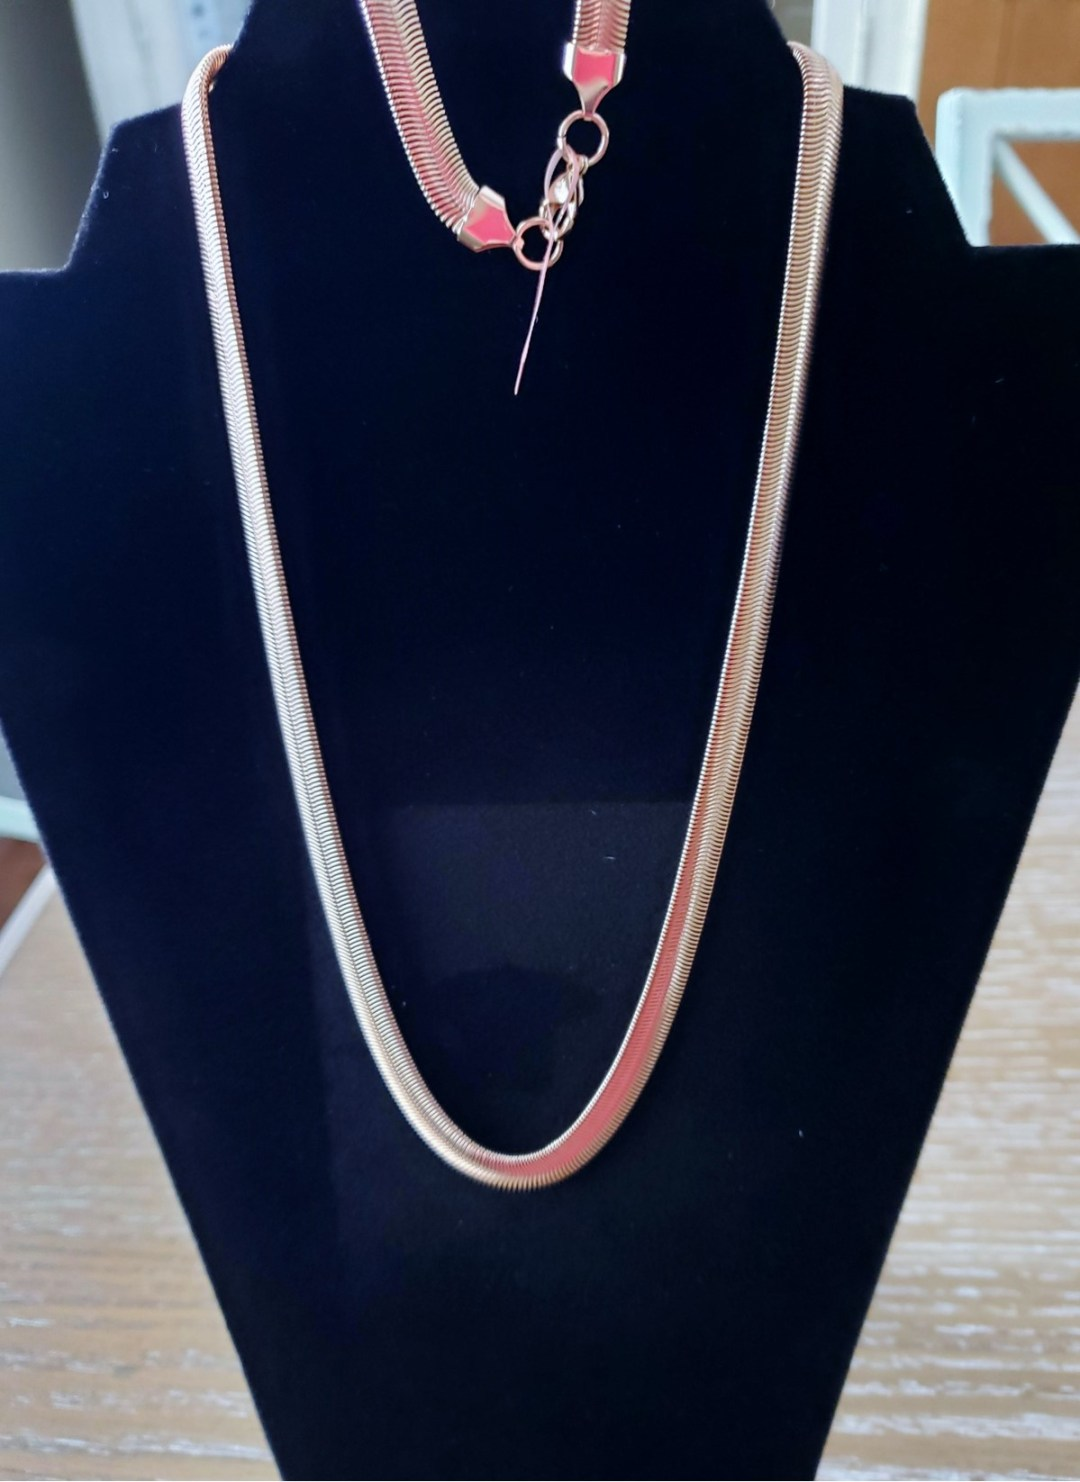 silver necklace - Basket Raffle